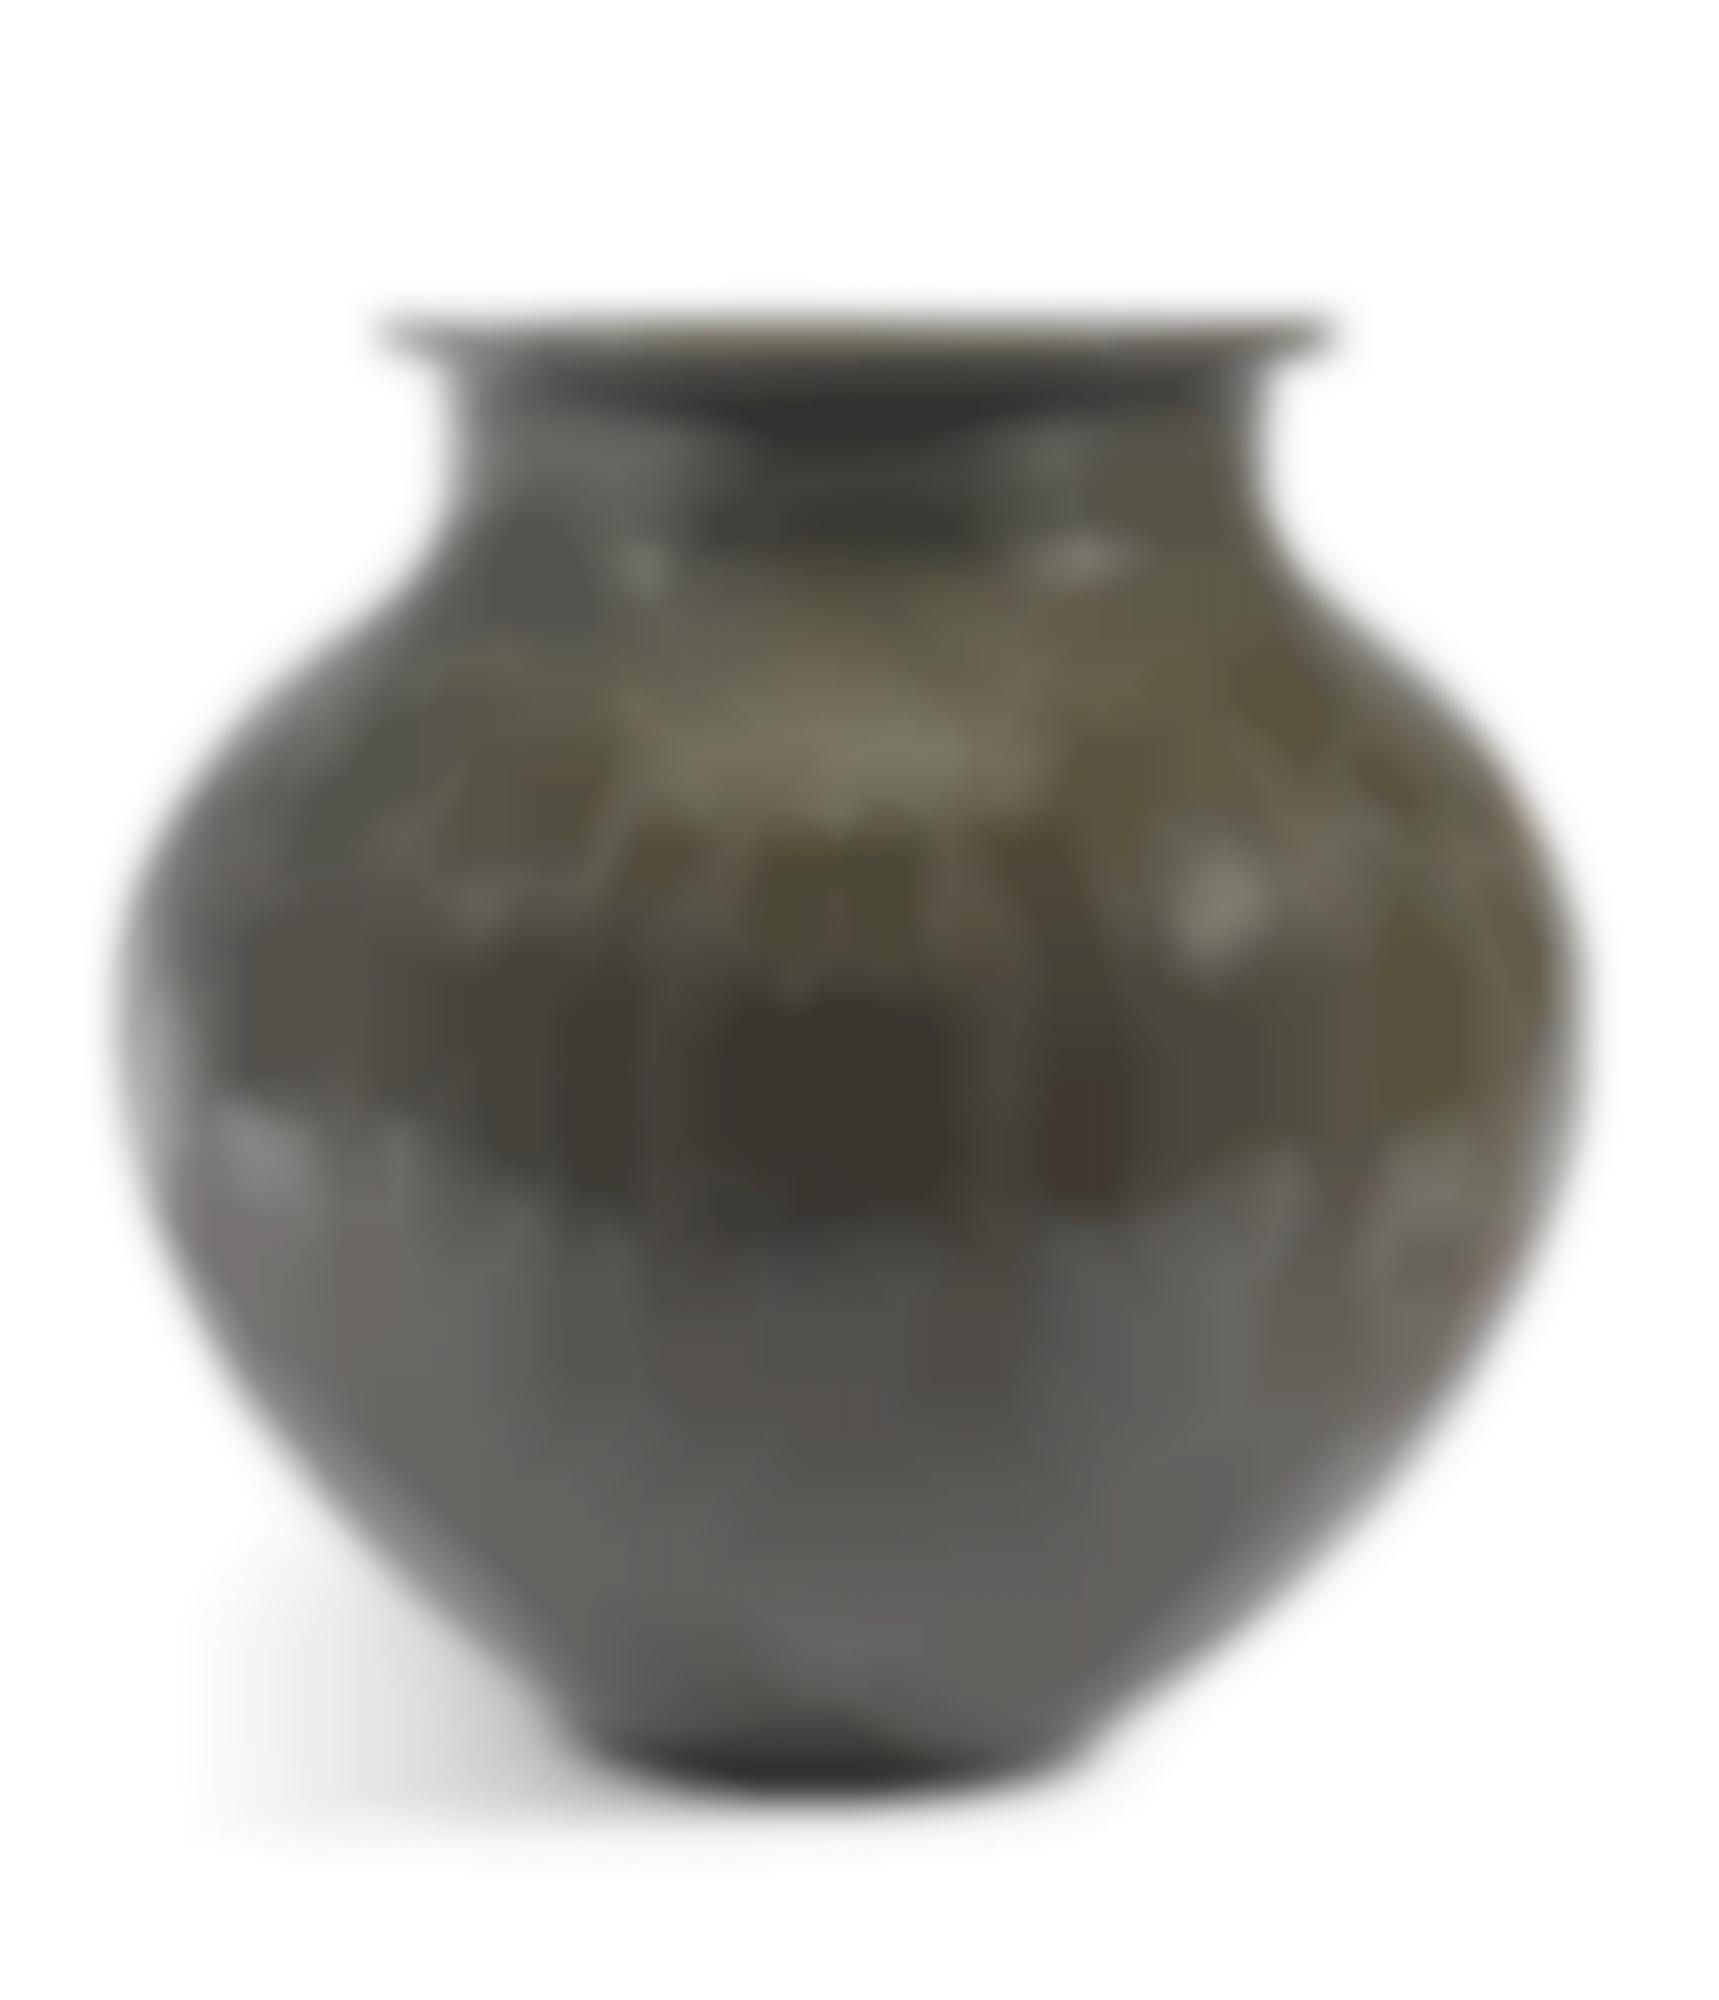 Lady Kwali-Attr. Ladi Kwali - Large Water Jar-1960